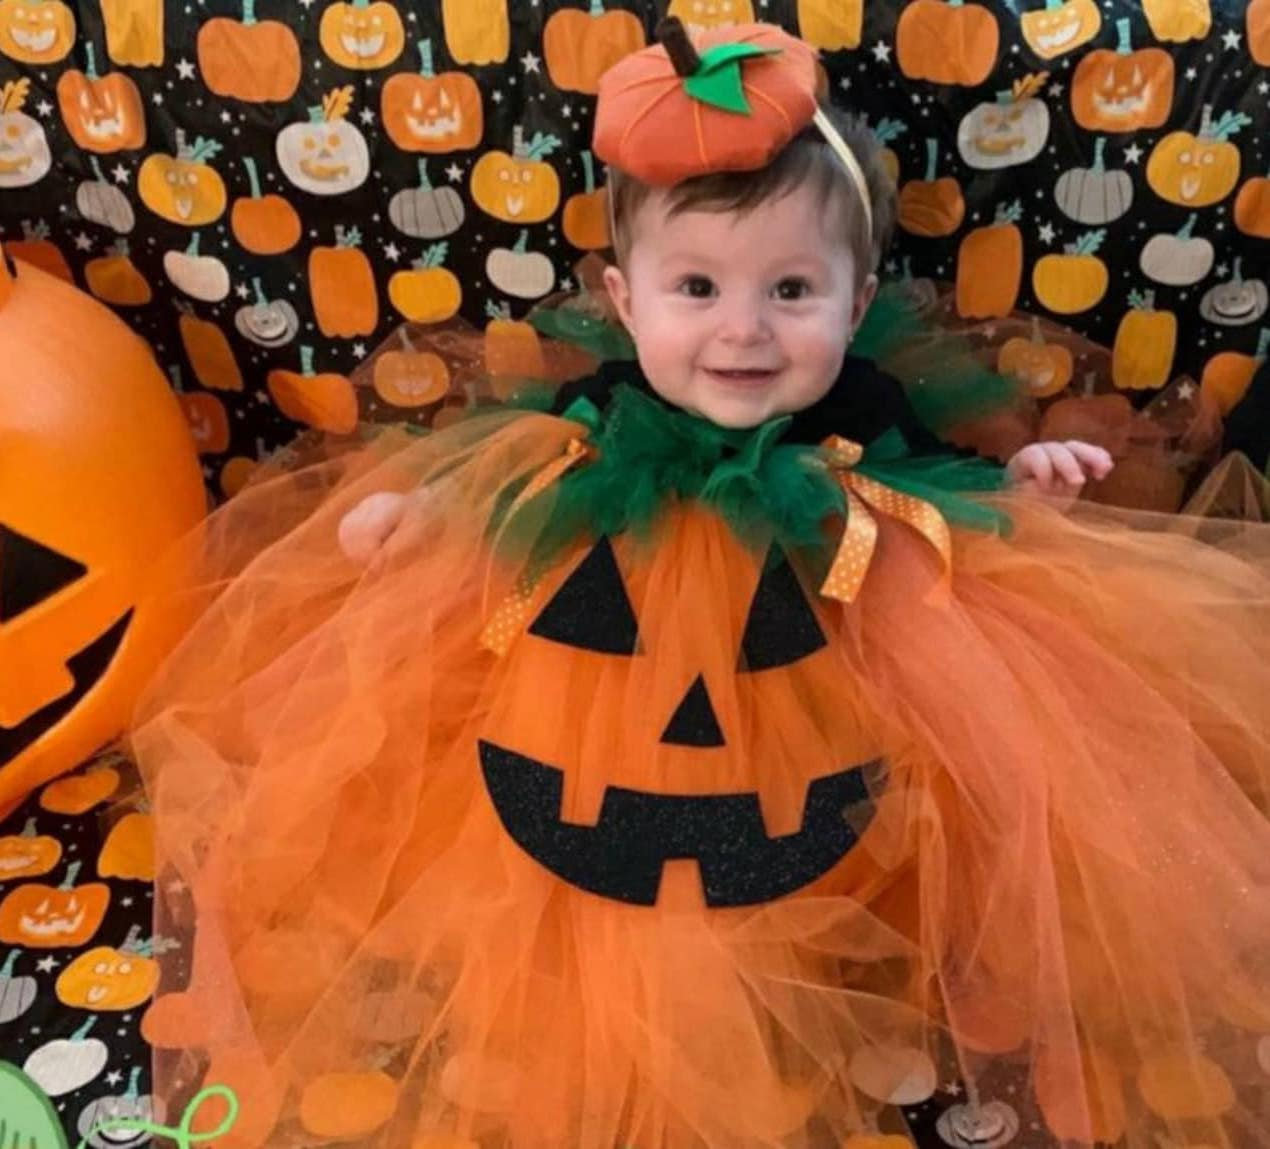 Cute baby pumpkin Halloween costume with orange tulle skirt